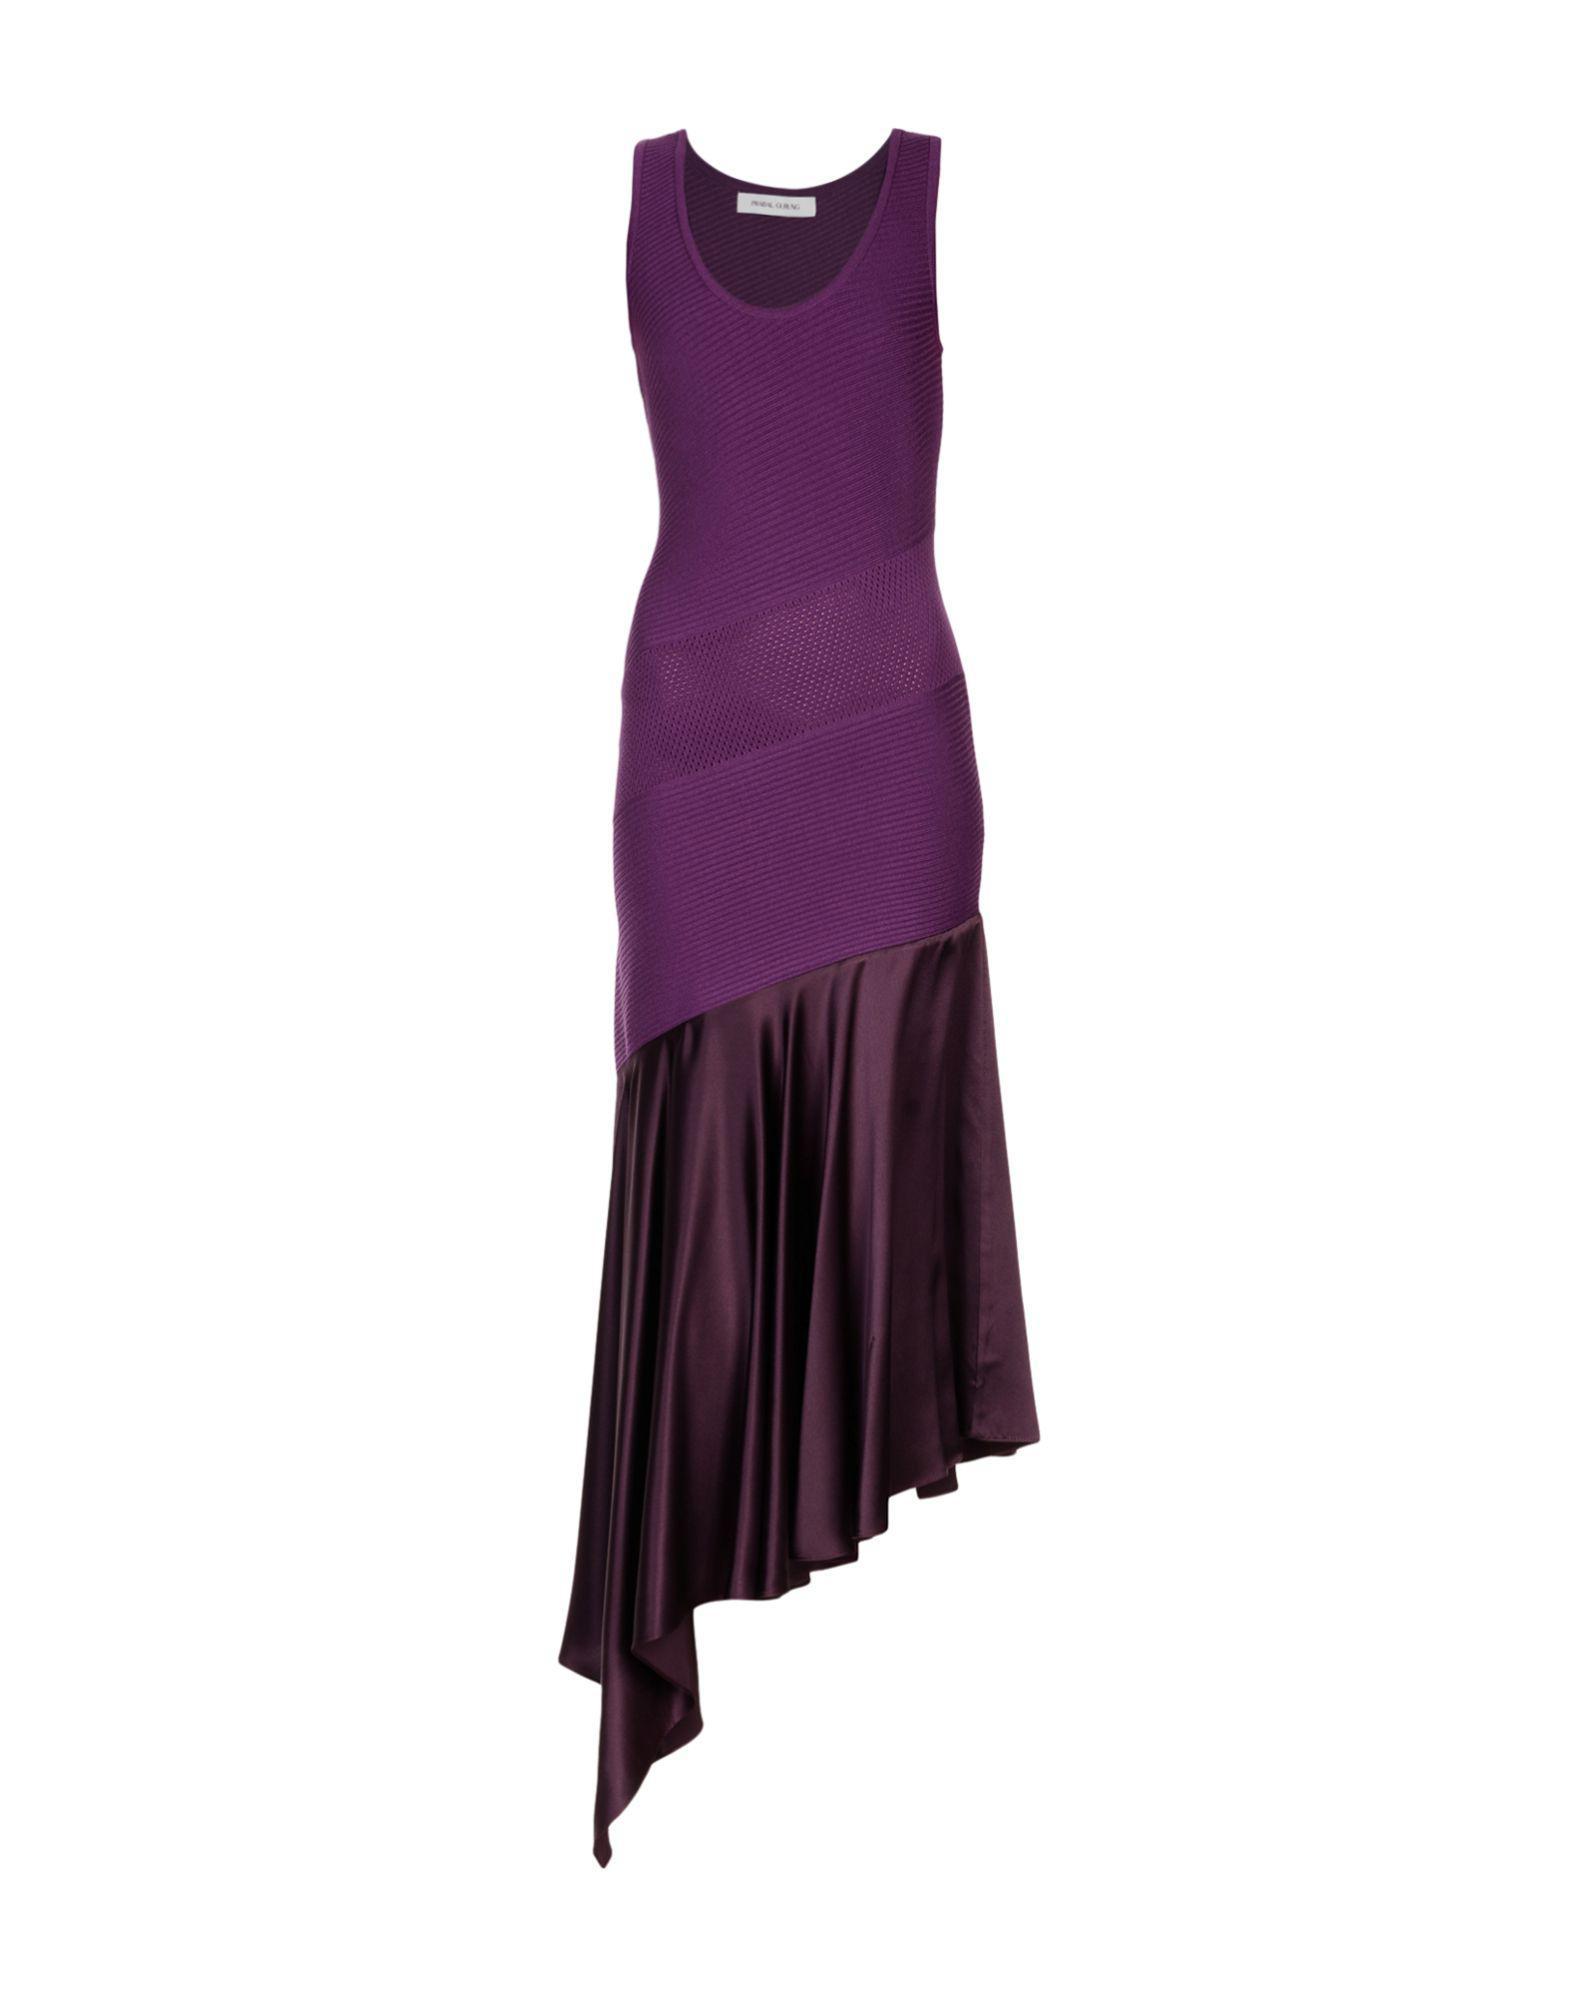 Alicia Tank dress - Pink & Purple Prabal Gurung SgqpuwEdLE